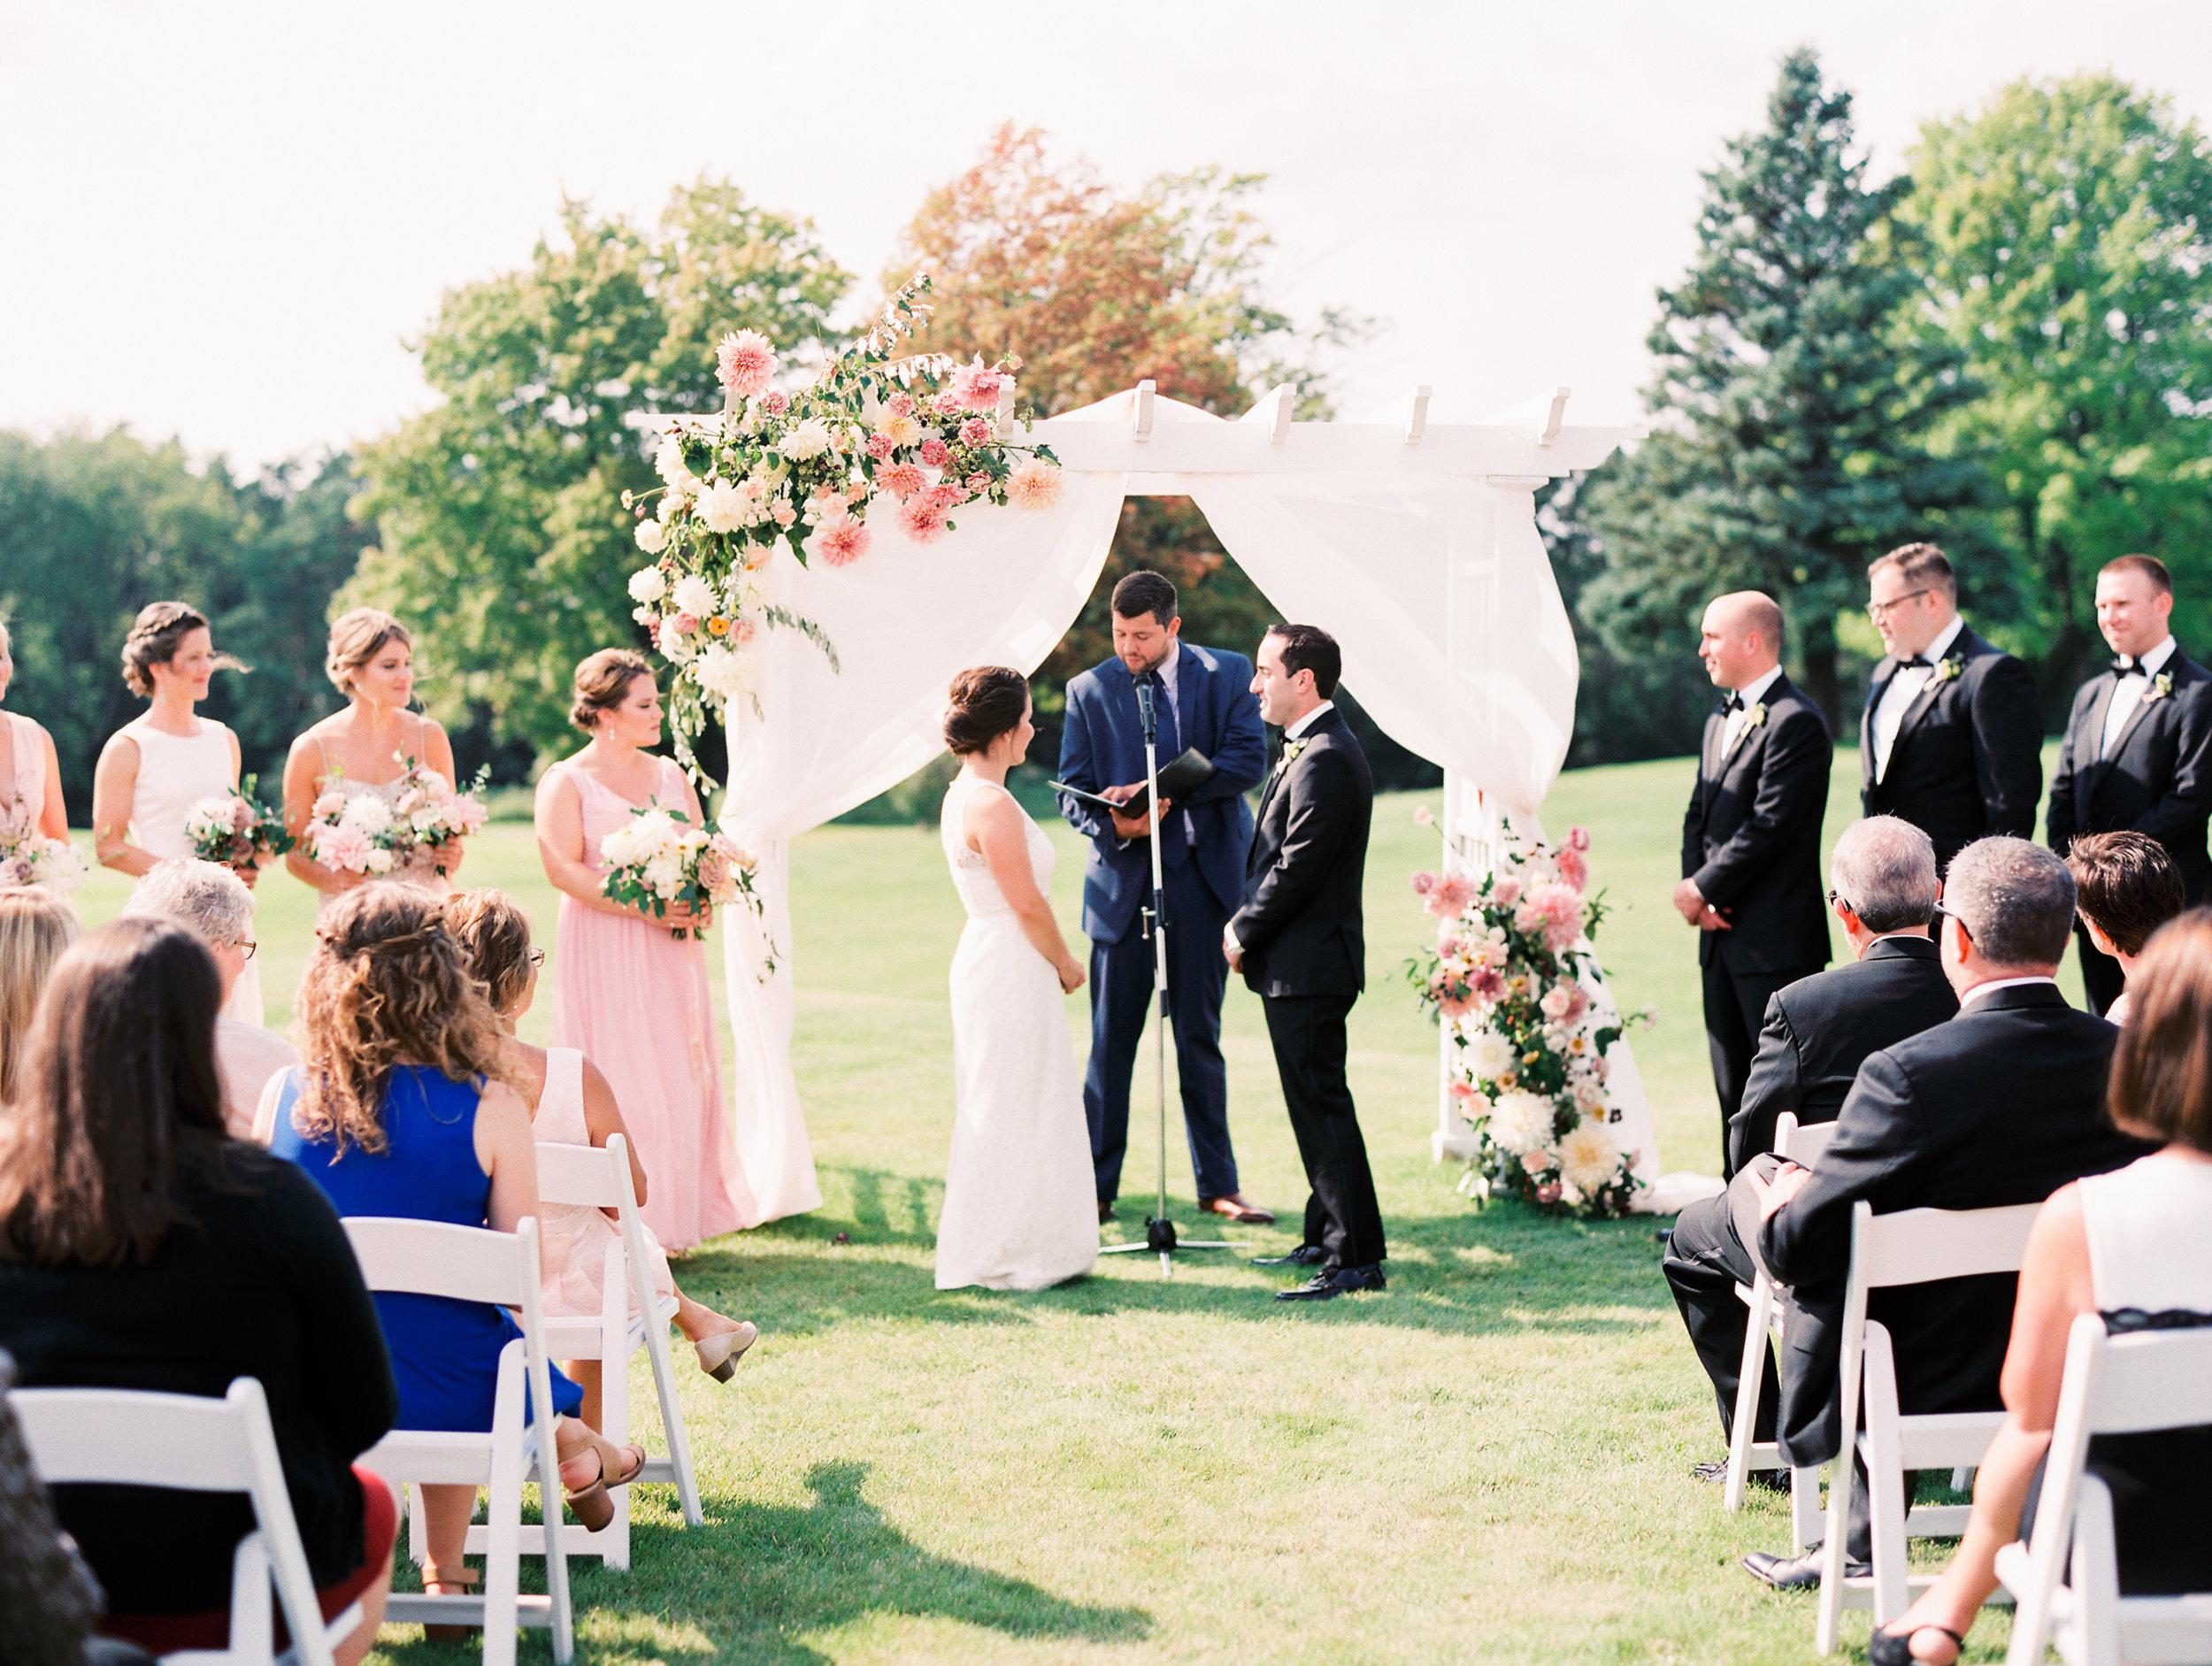 Zoller+Wedding+Ceremonyf-27.jpg